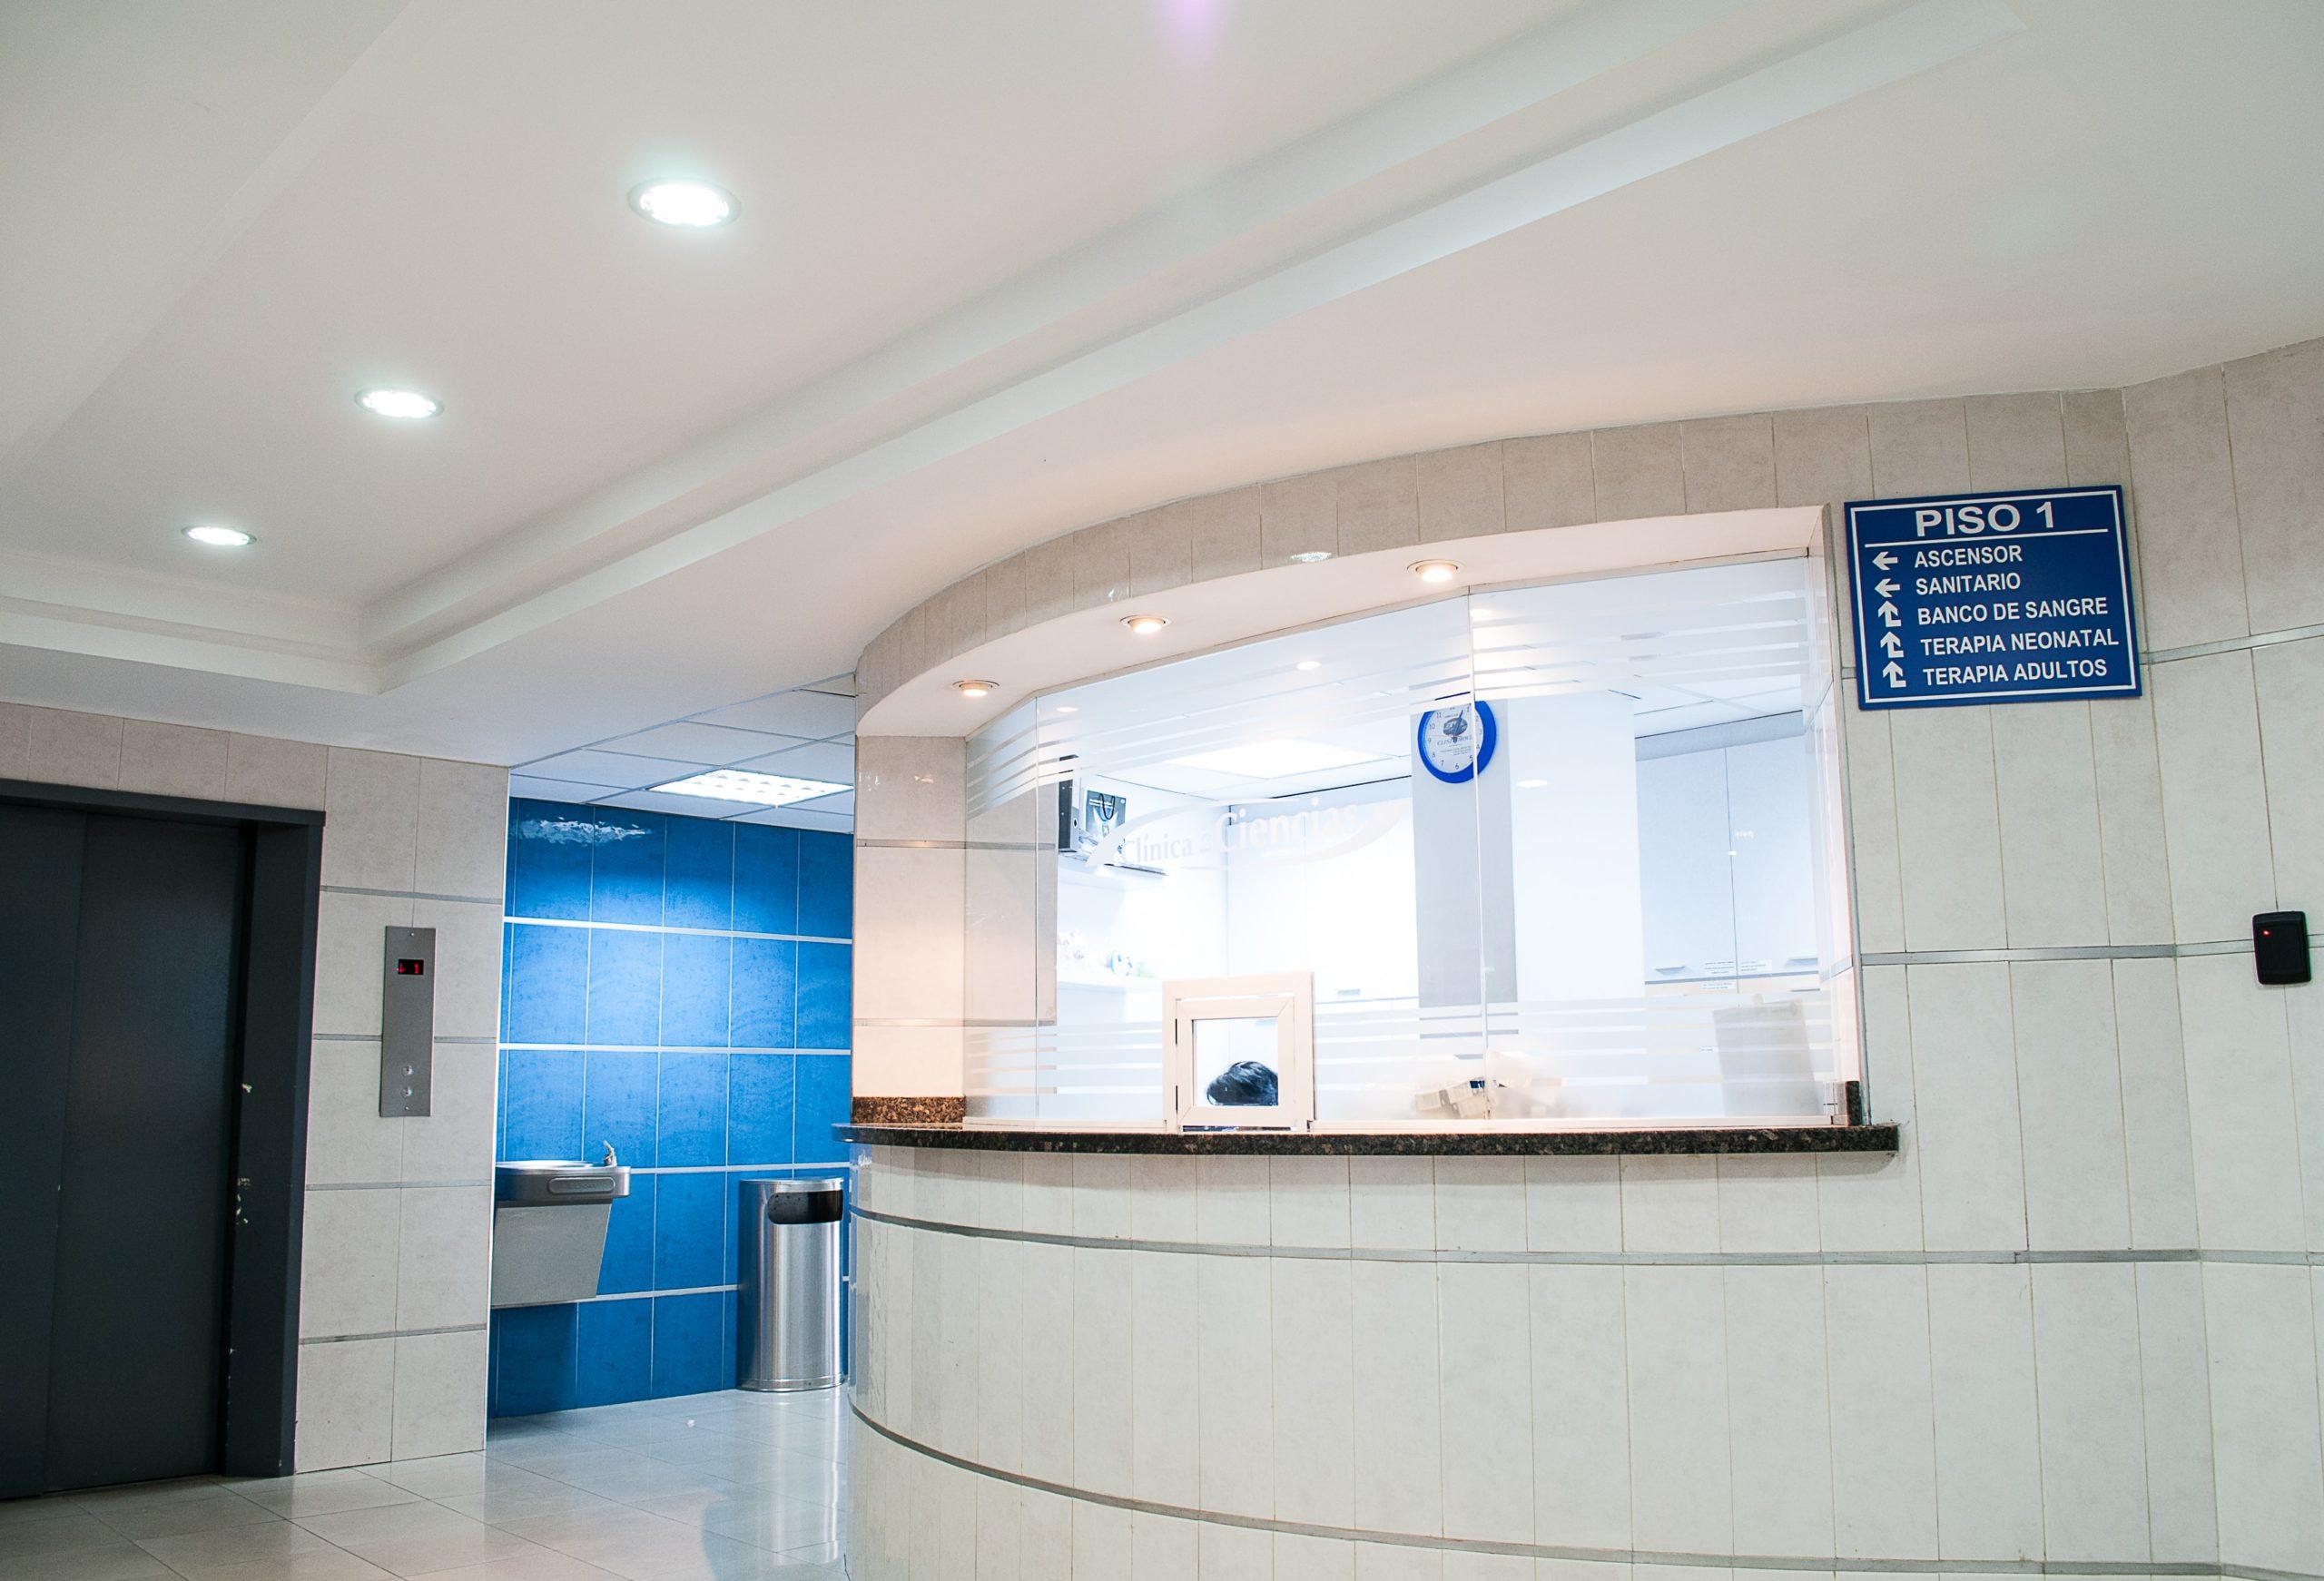 Reformas en Córdoba para clínicas scaled - Reformas en Córdoba para tu clínica